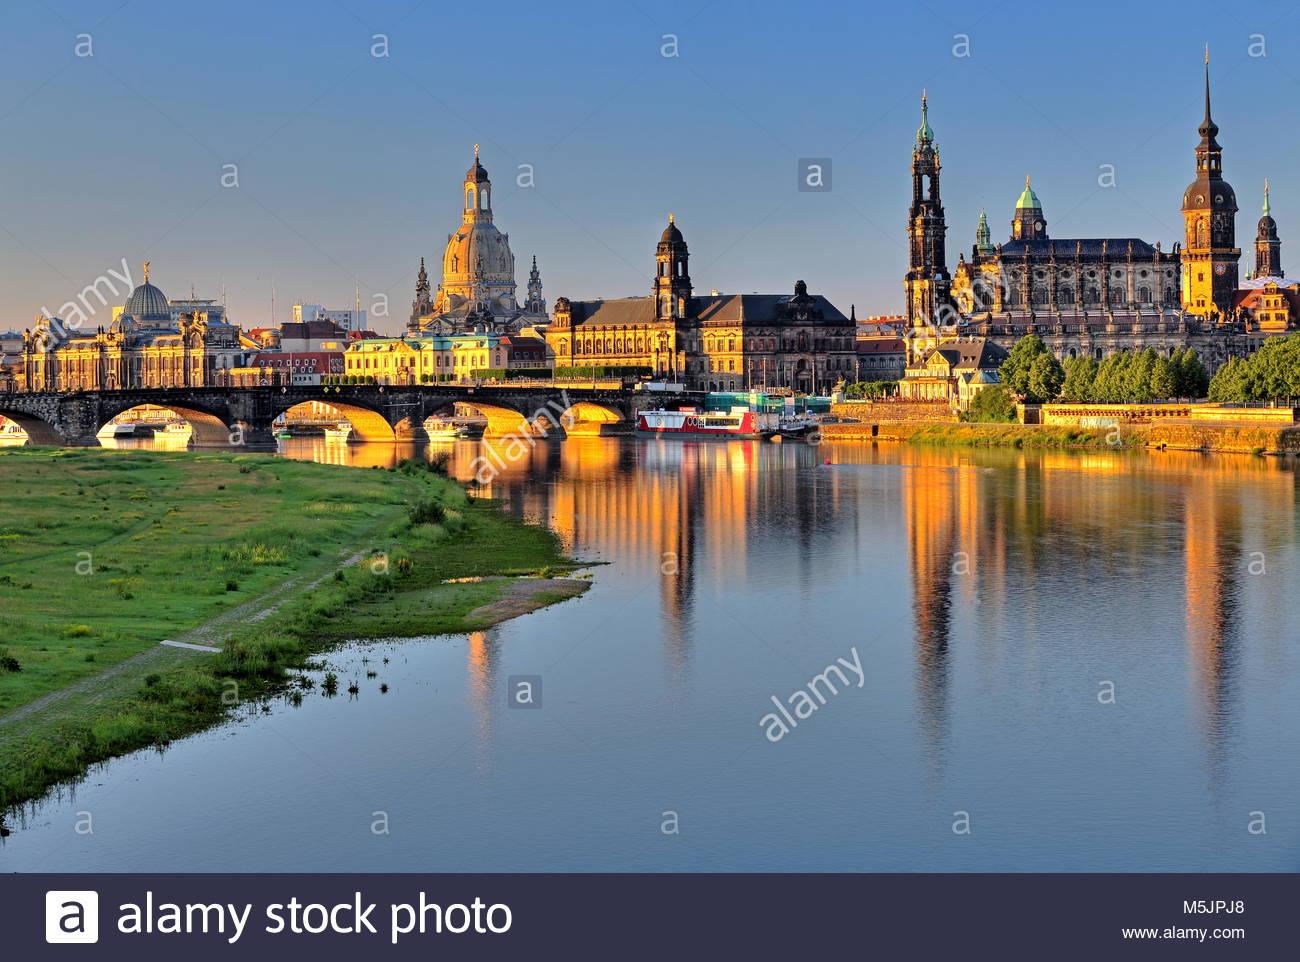 Elbe river with Augustusbrücke,University of Art,Frauenkirche,Higher Regional Court,Hofkirche and Schlossturm,Old - Stock Image